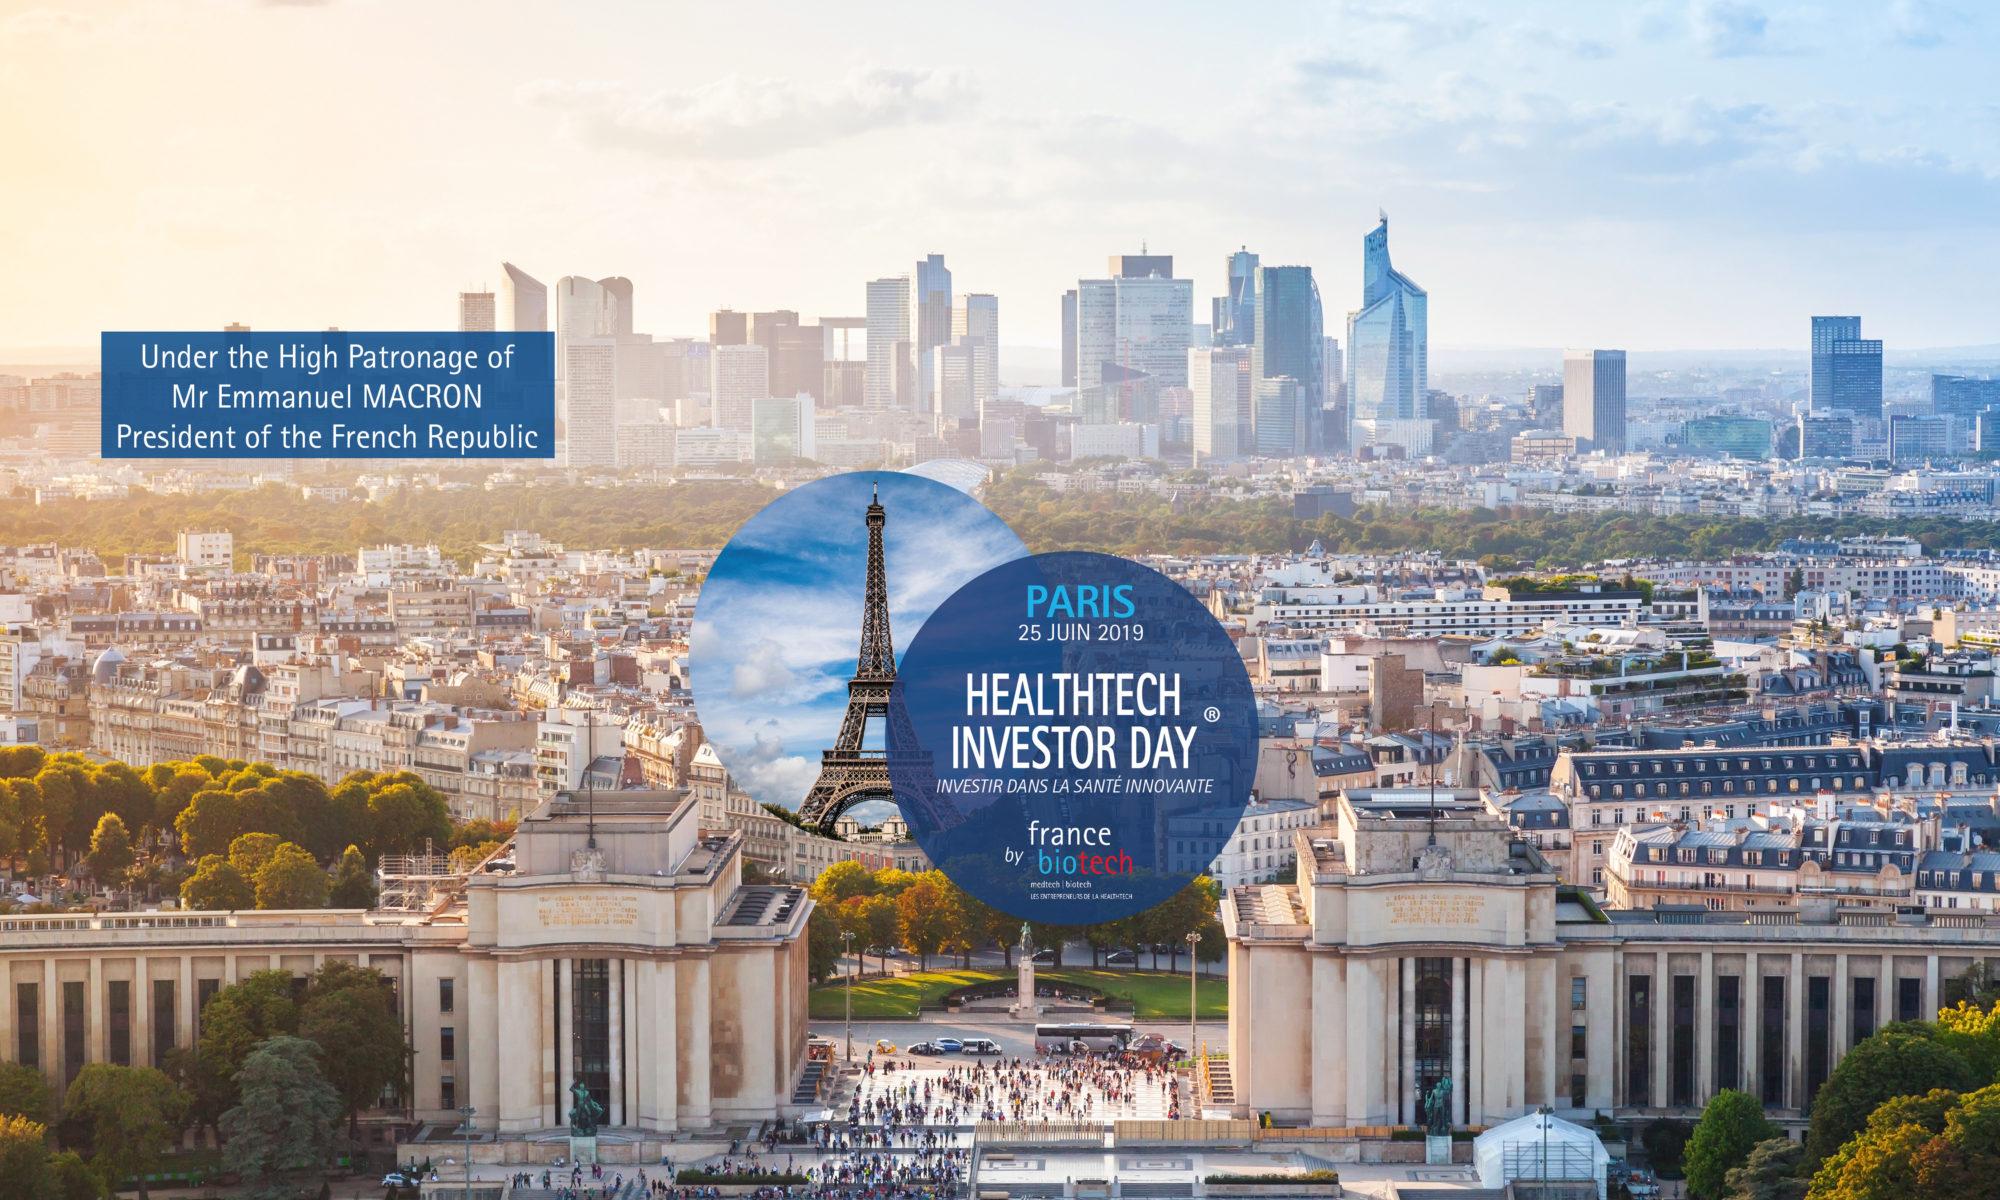 HealthTech Investor Day